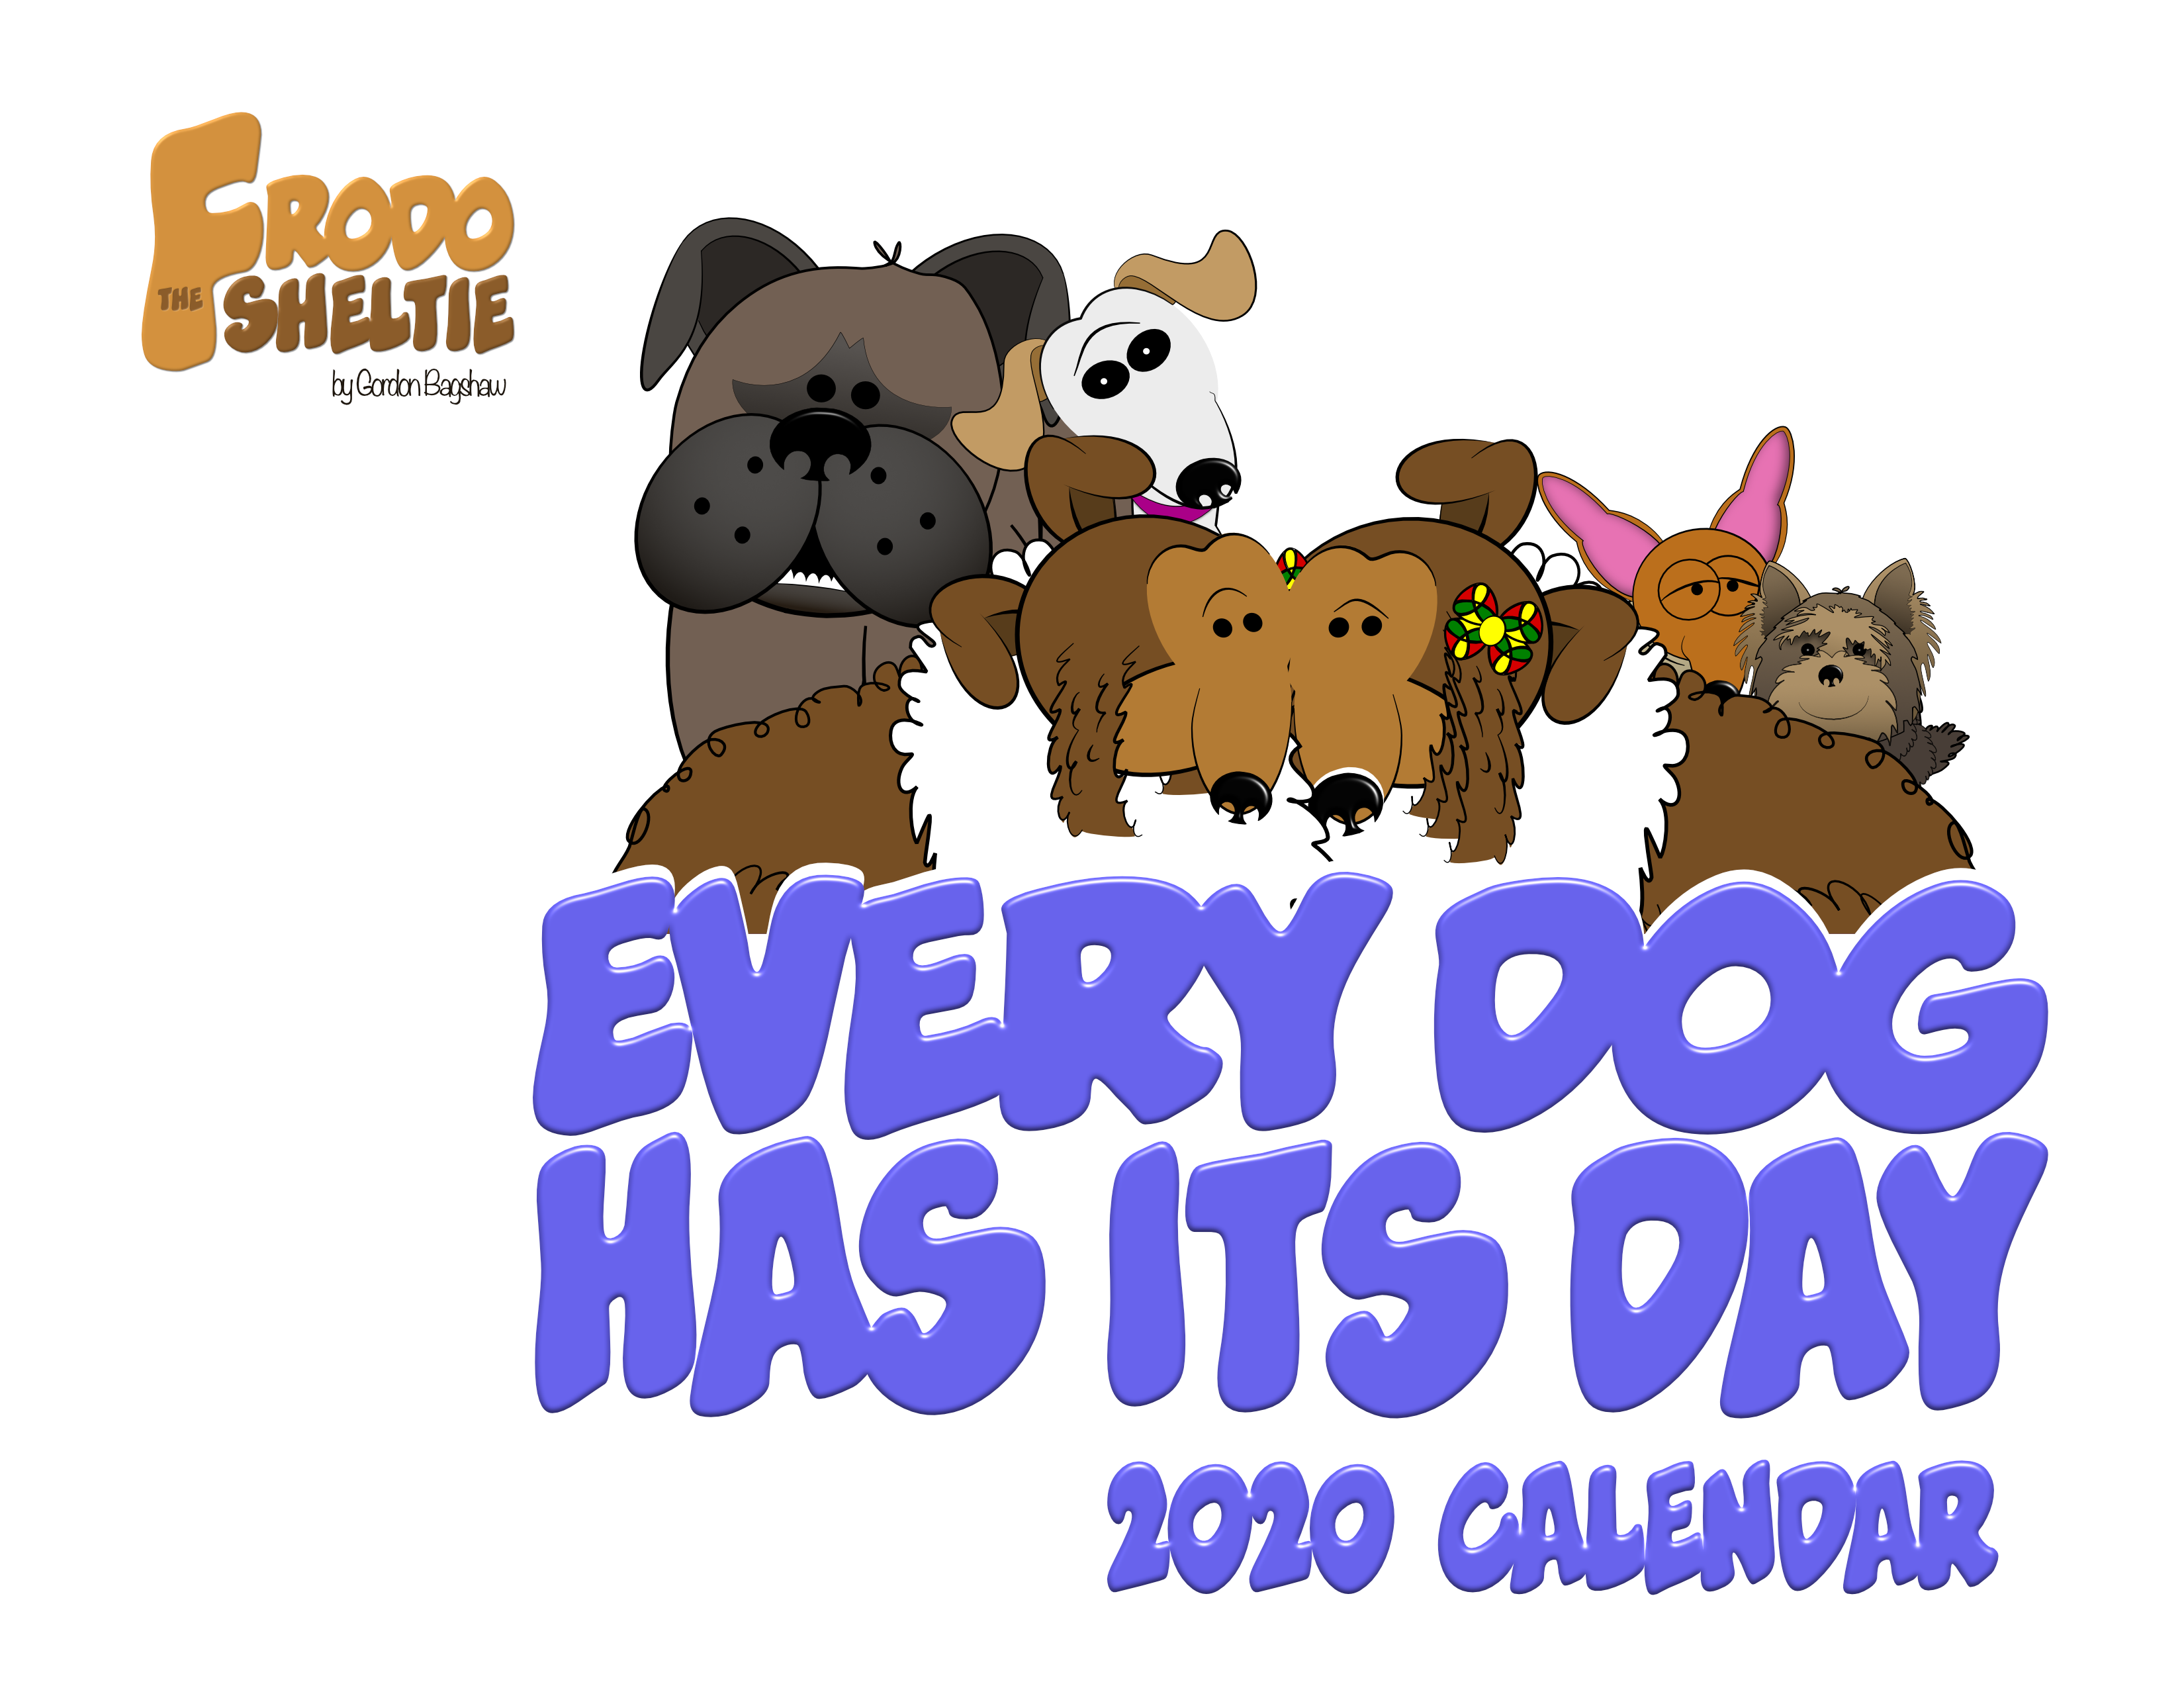 Frodo the Sheltie: Every Dog Has Its Day (2020 Calendar)